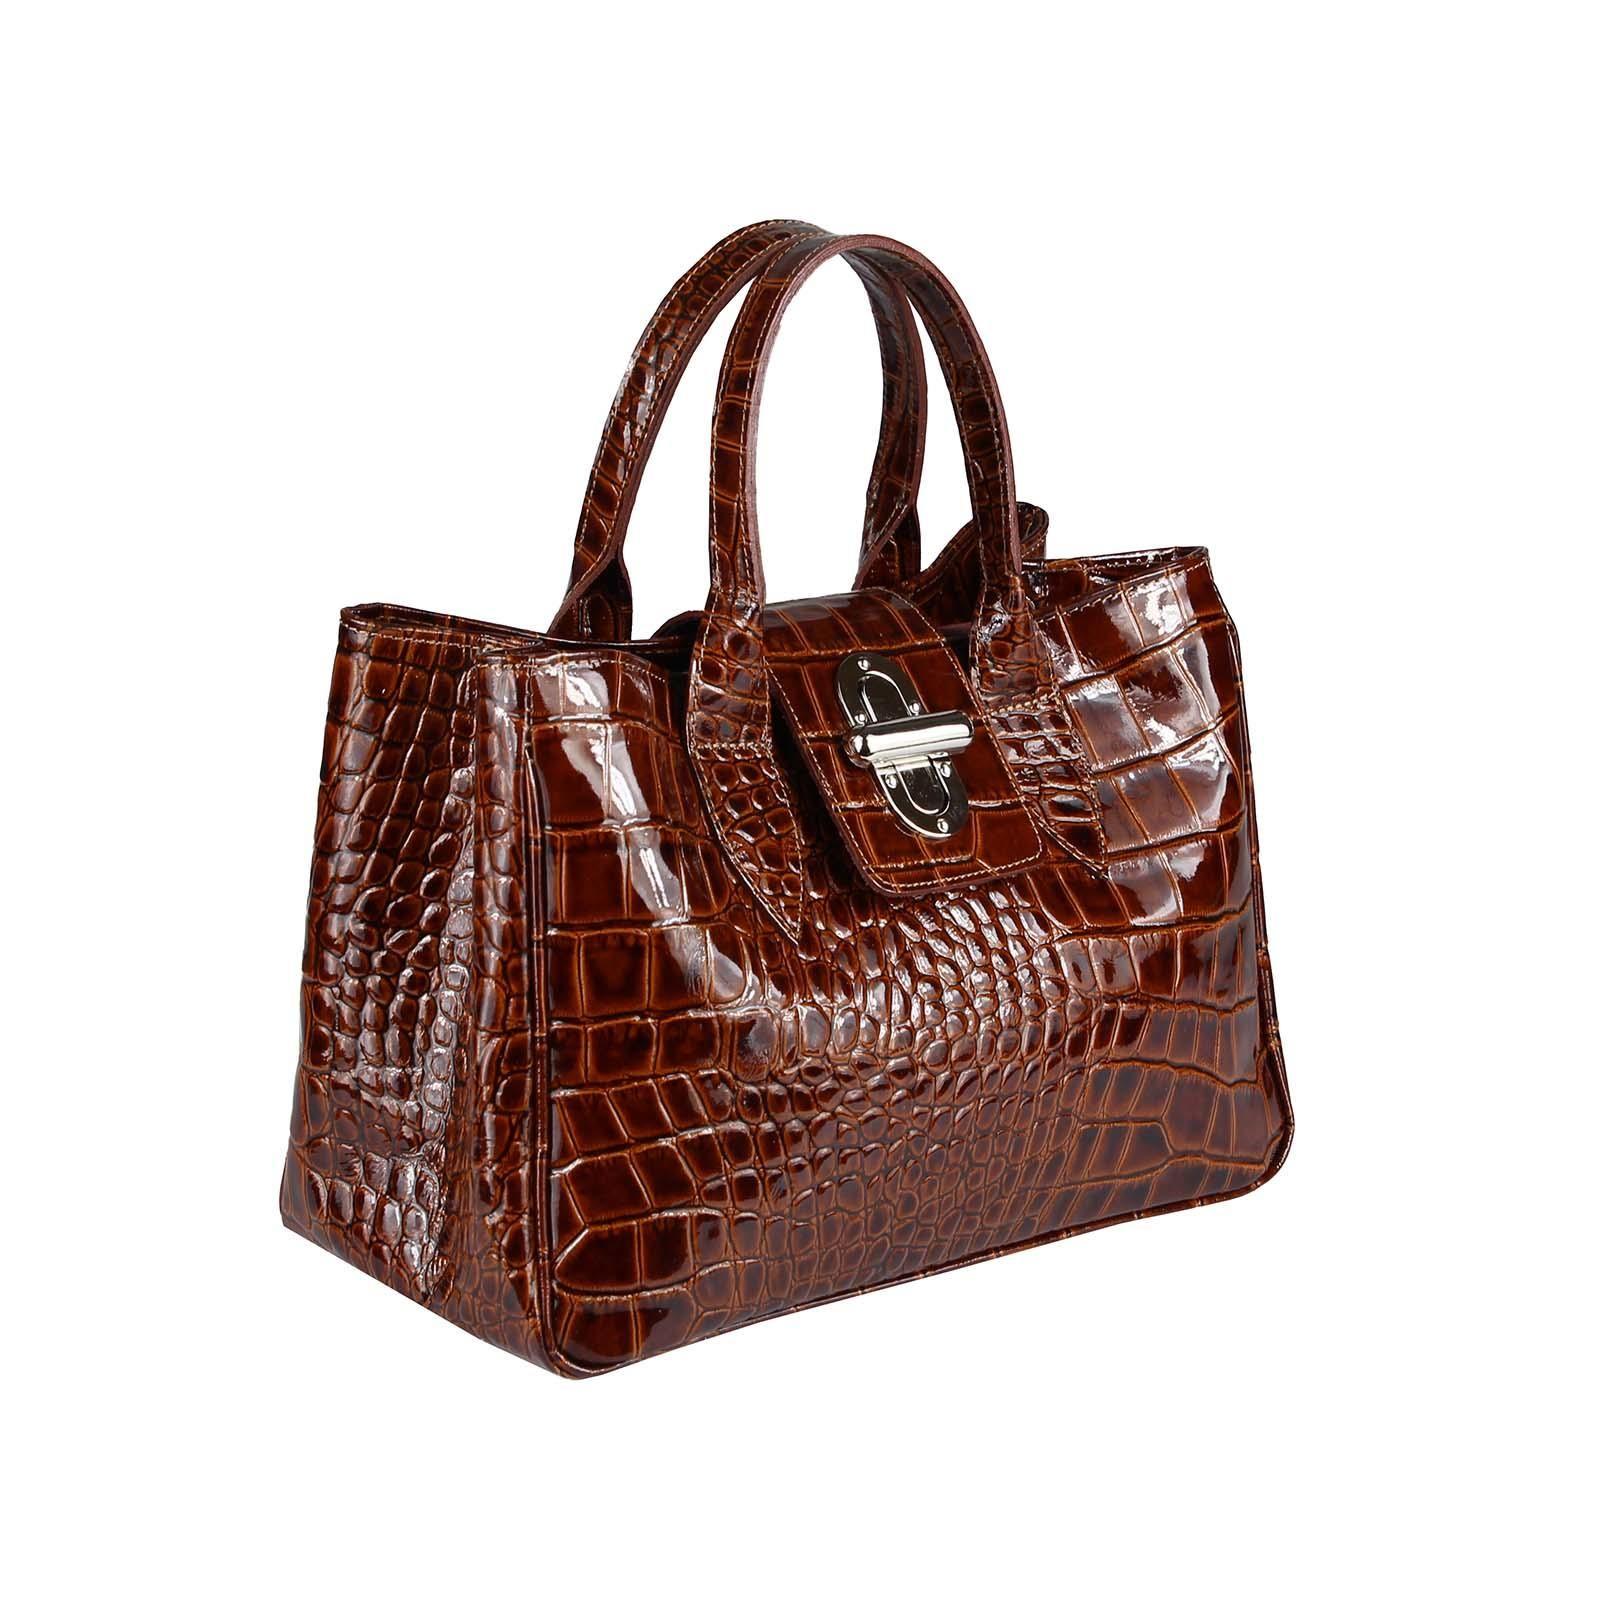 ITAL DAMEN LACKLEDER TASCHE Handtasche Umhängetasche Shopper